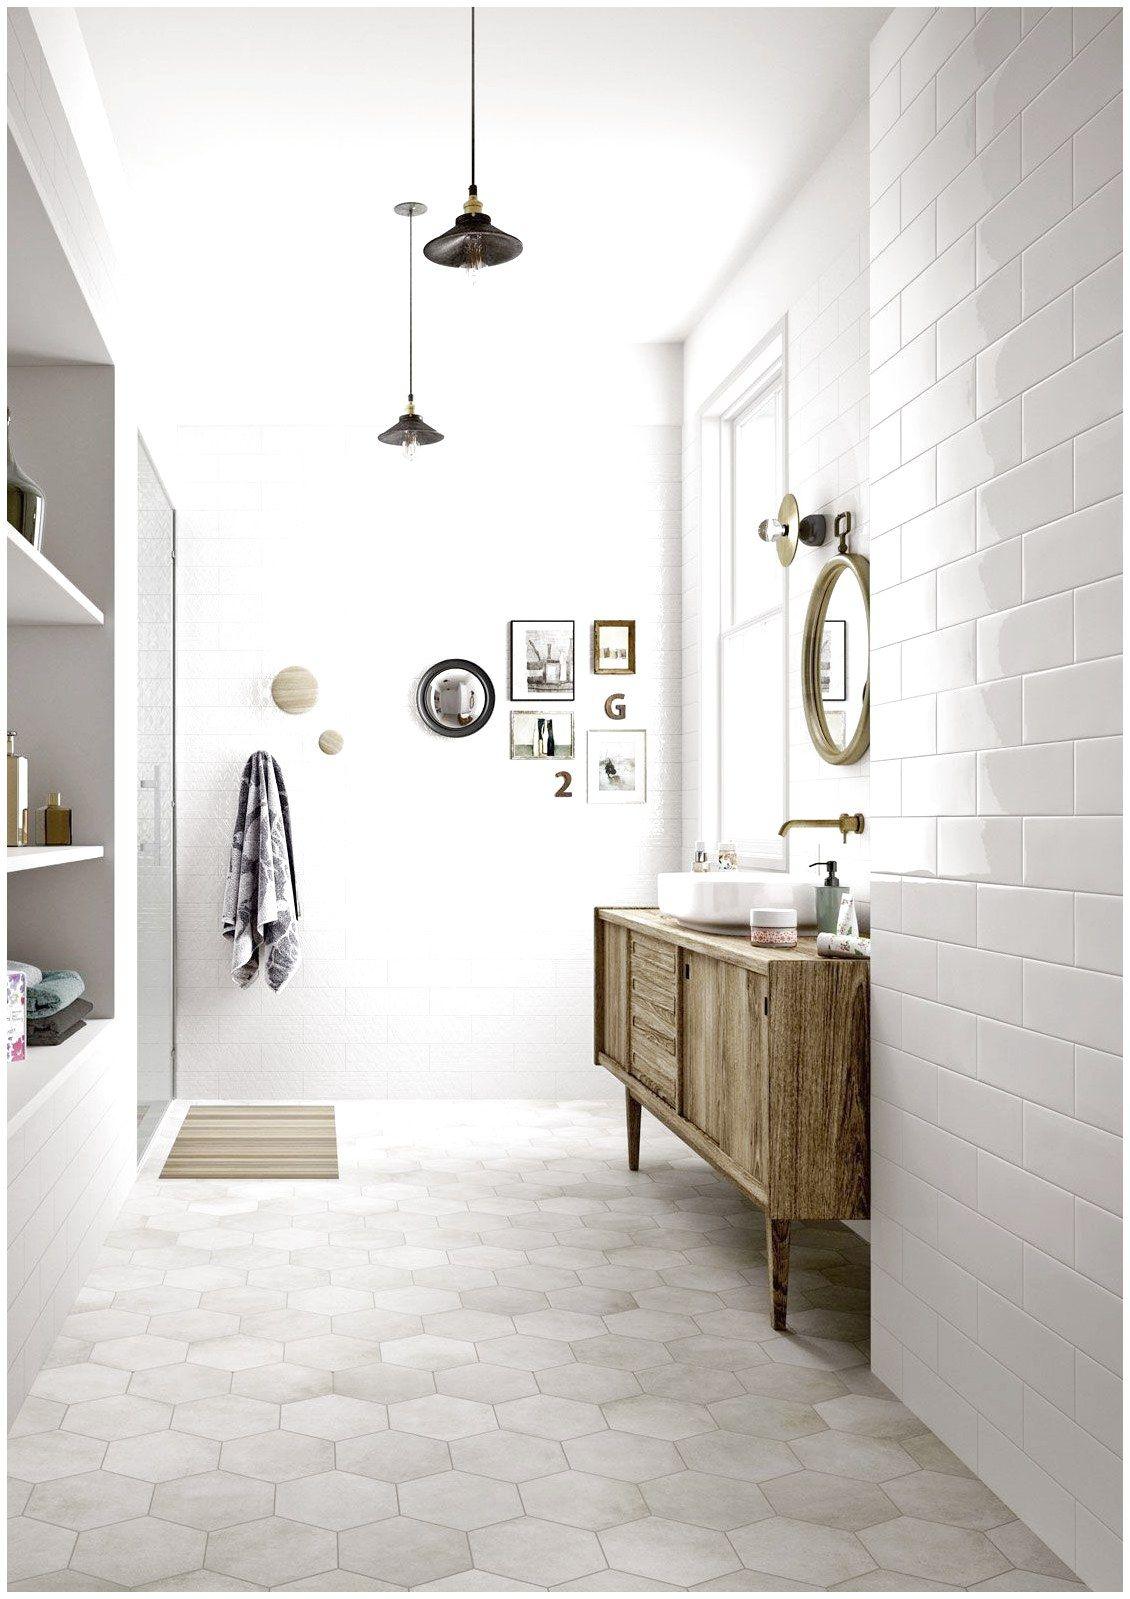 bathroom tiles ceramic and porcelain stoneware marazzi 6894 rh pinterest com